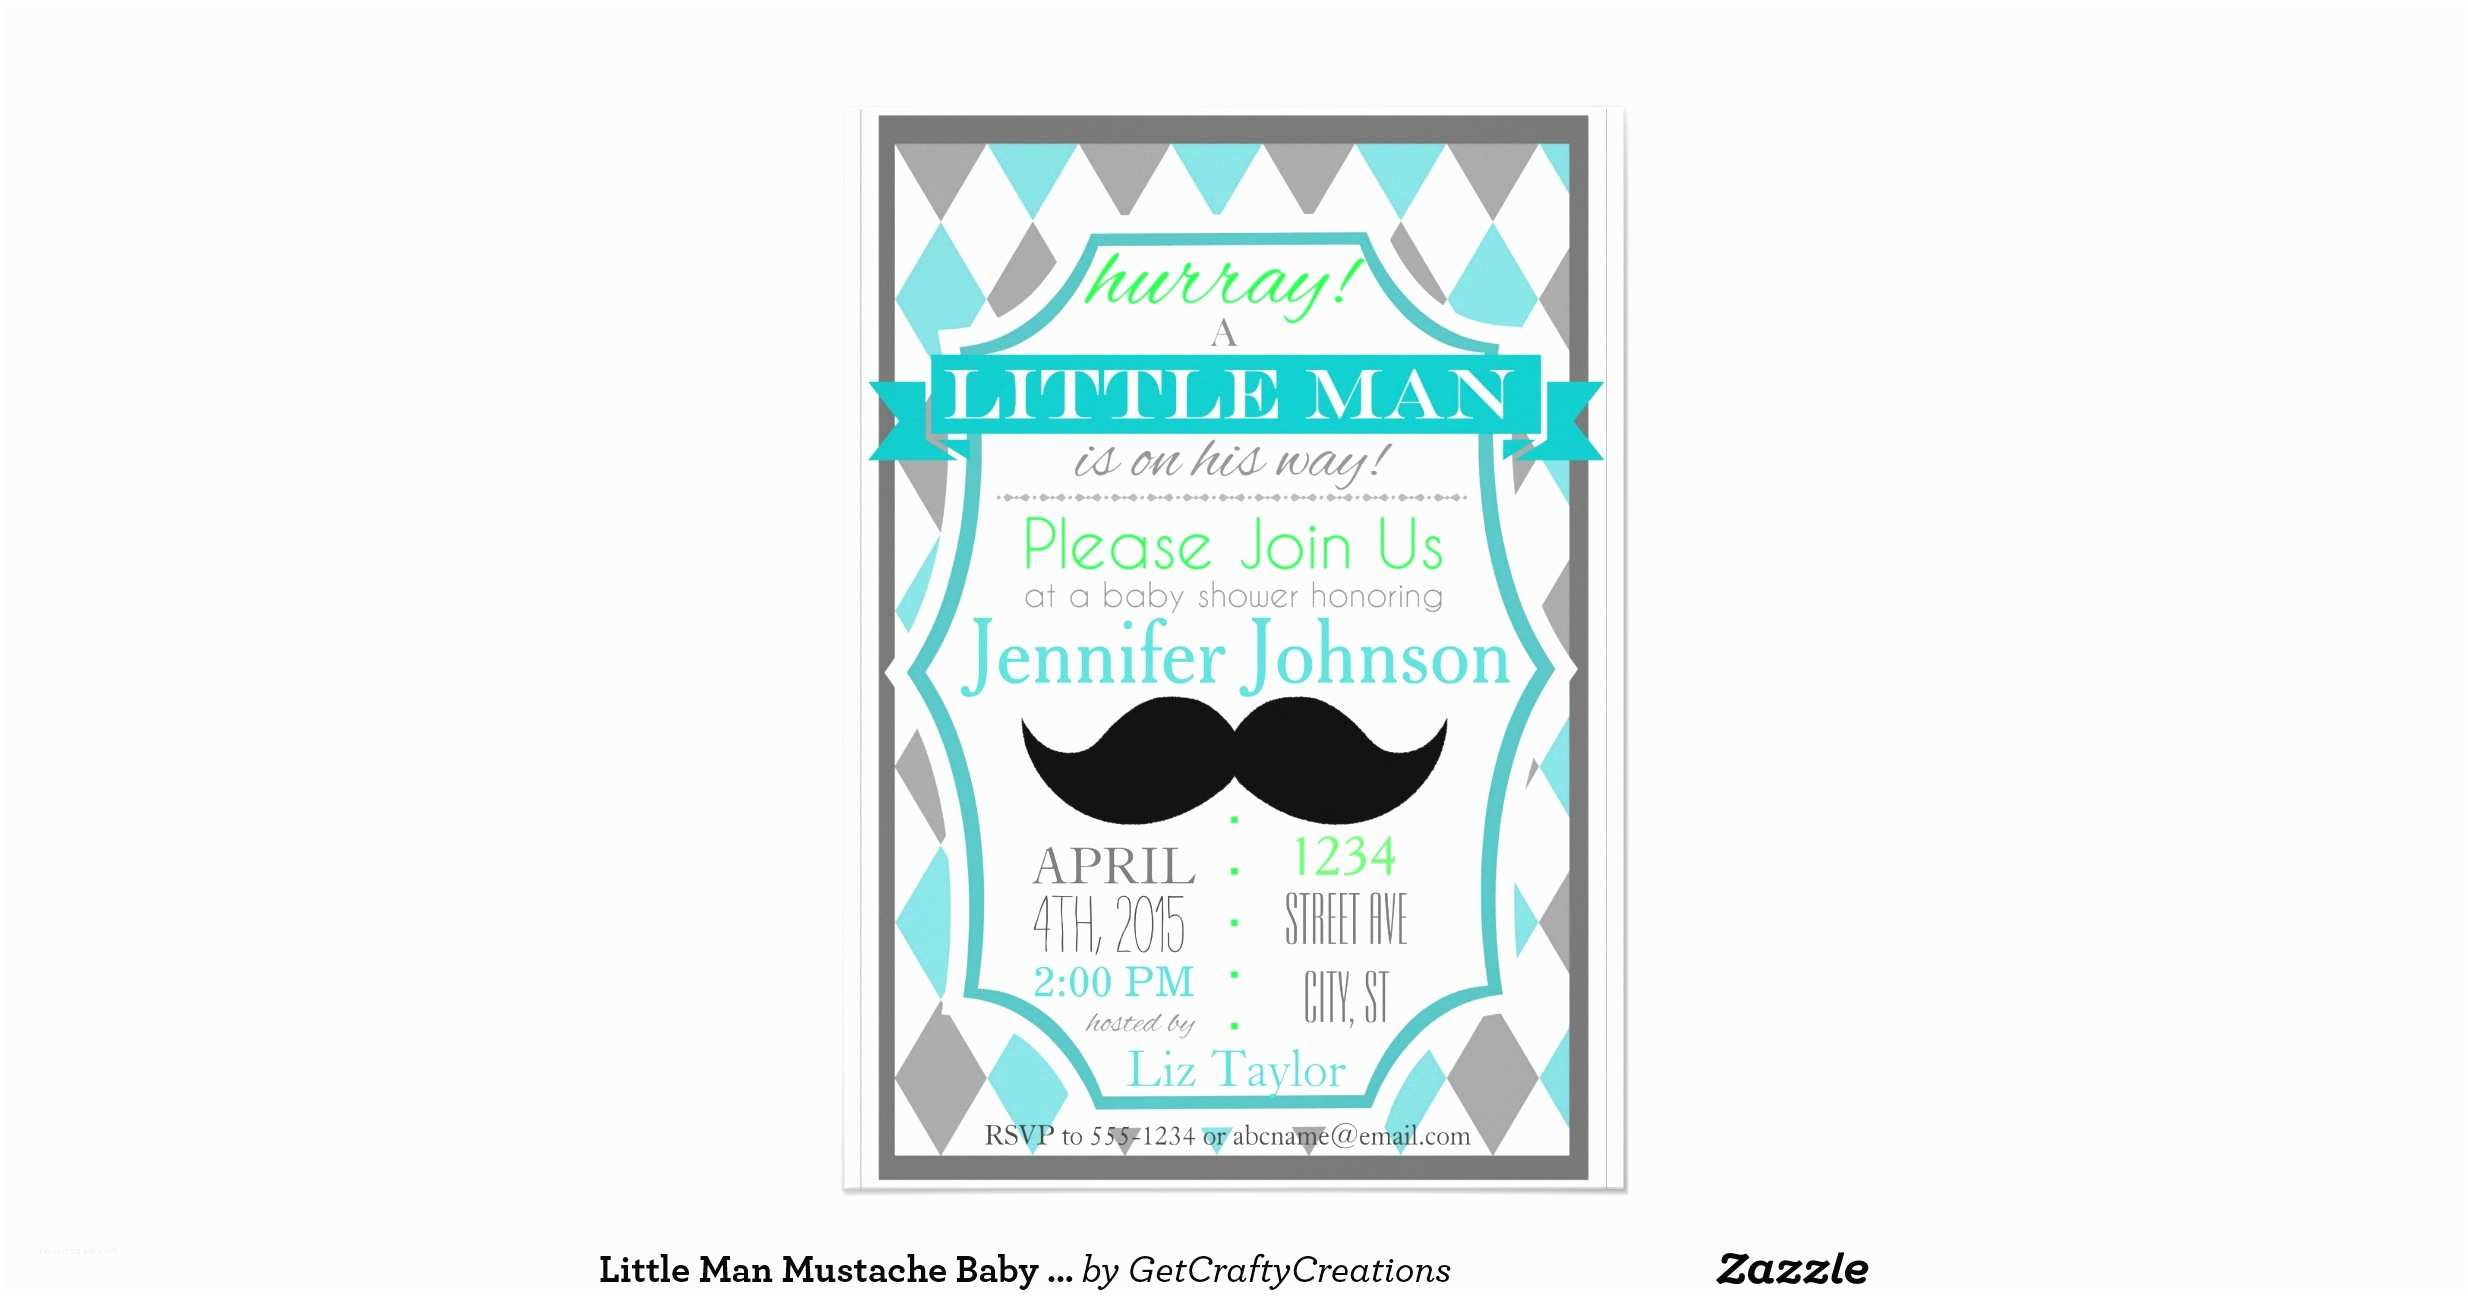 Little Man Baby Shower Invitations Little Man Mustache Baby Shower Invitations